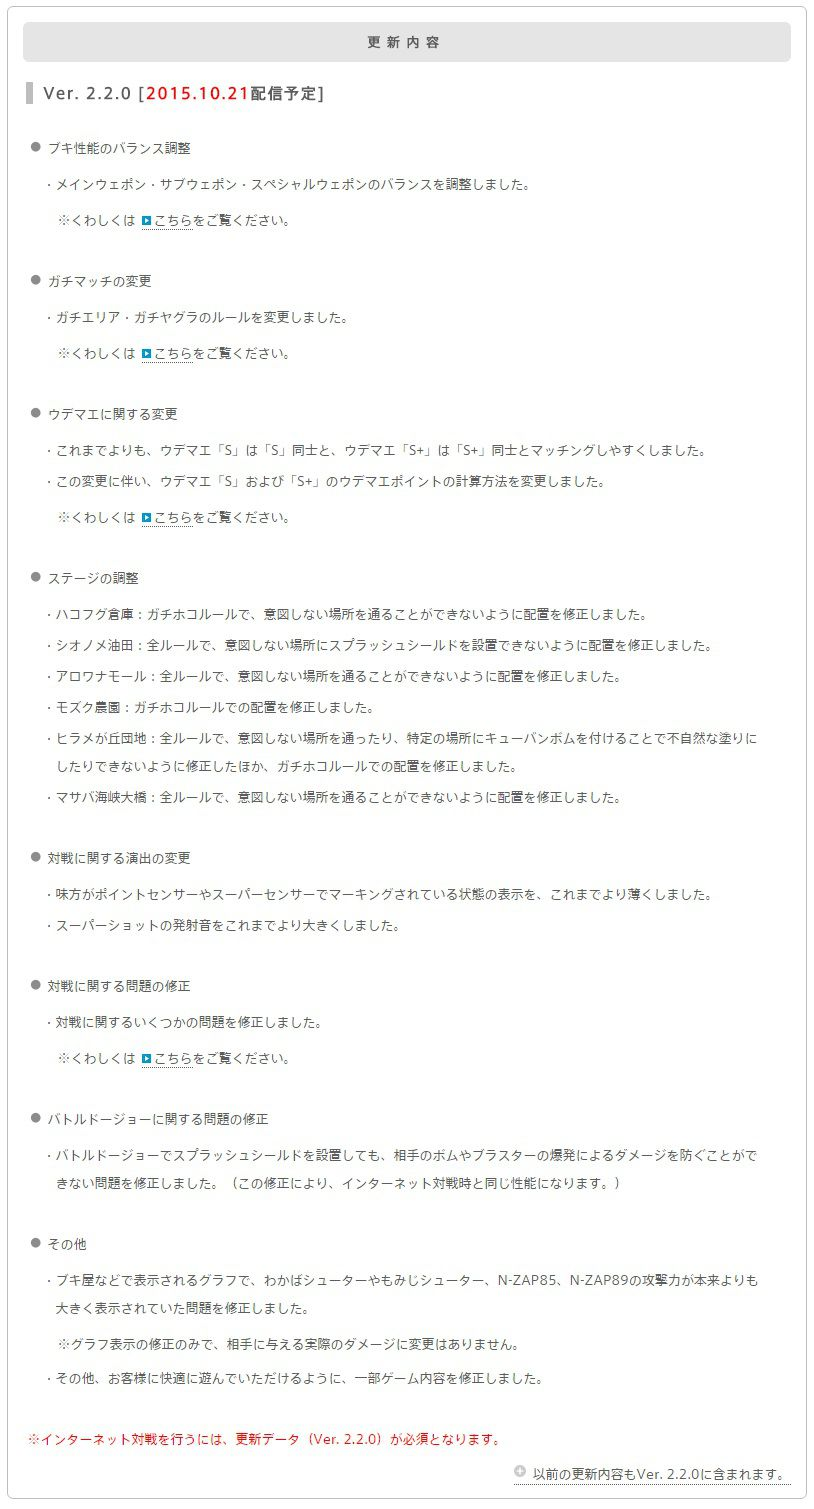 image_3133.jpg